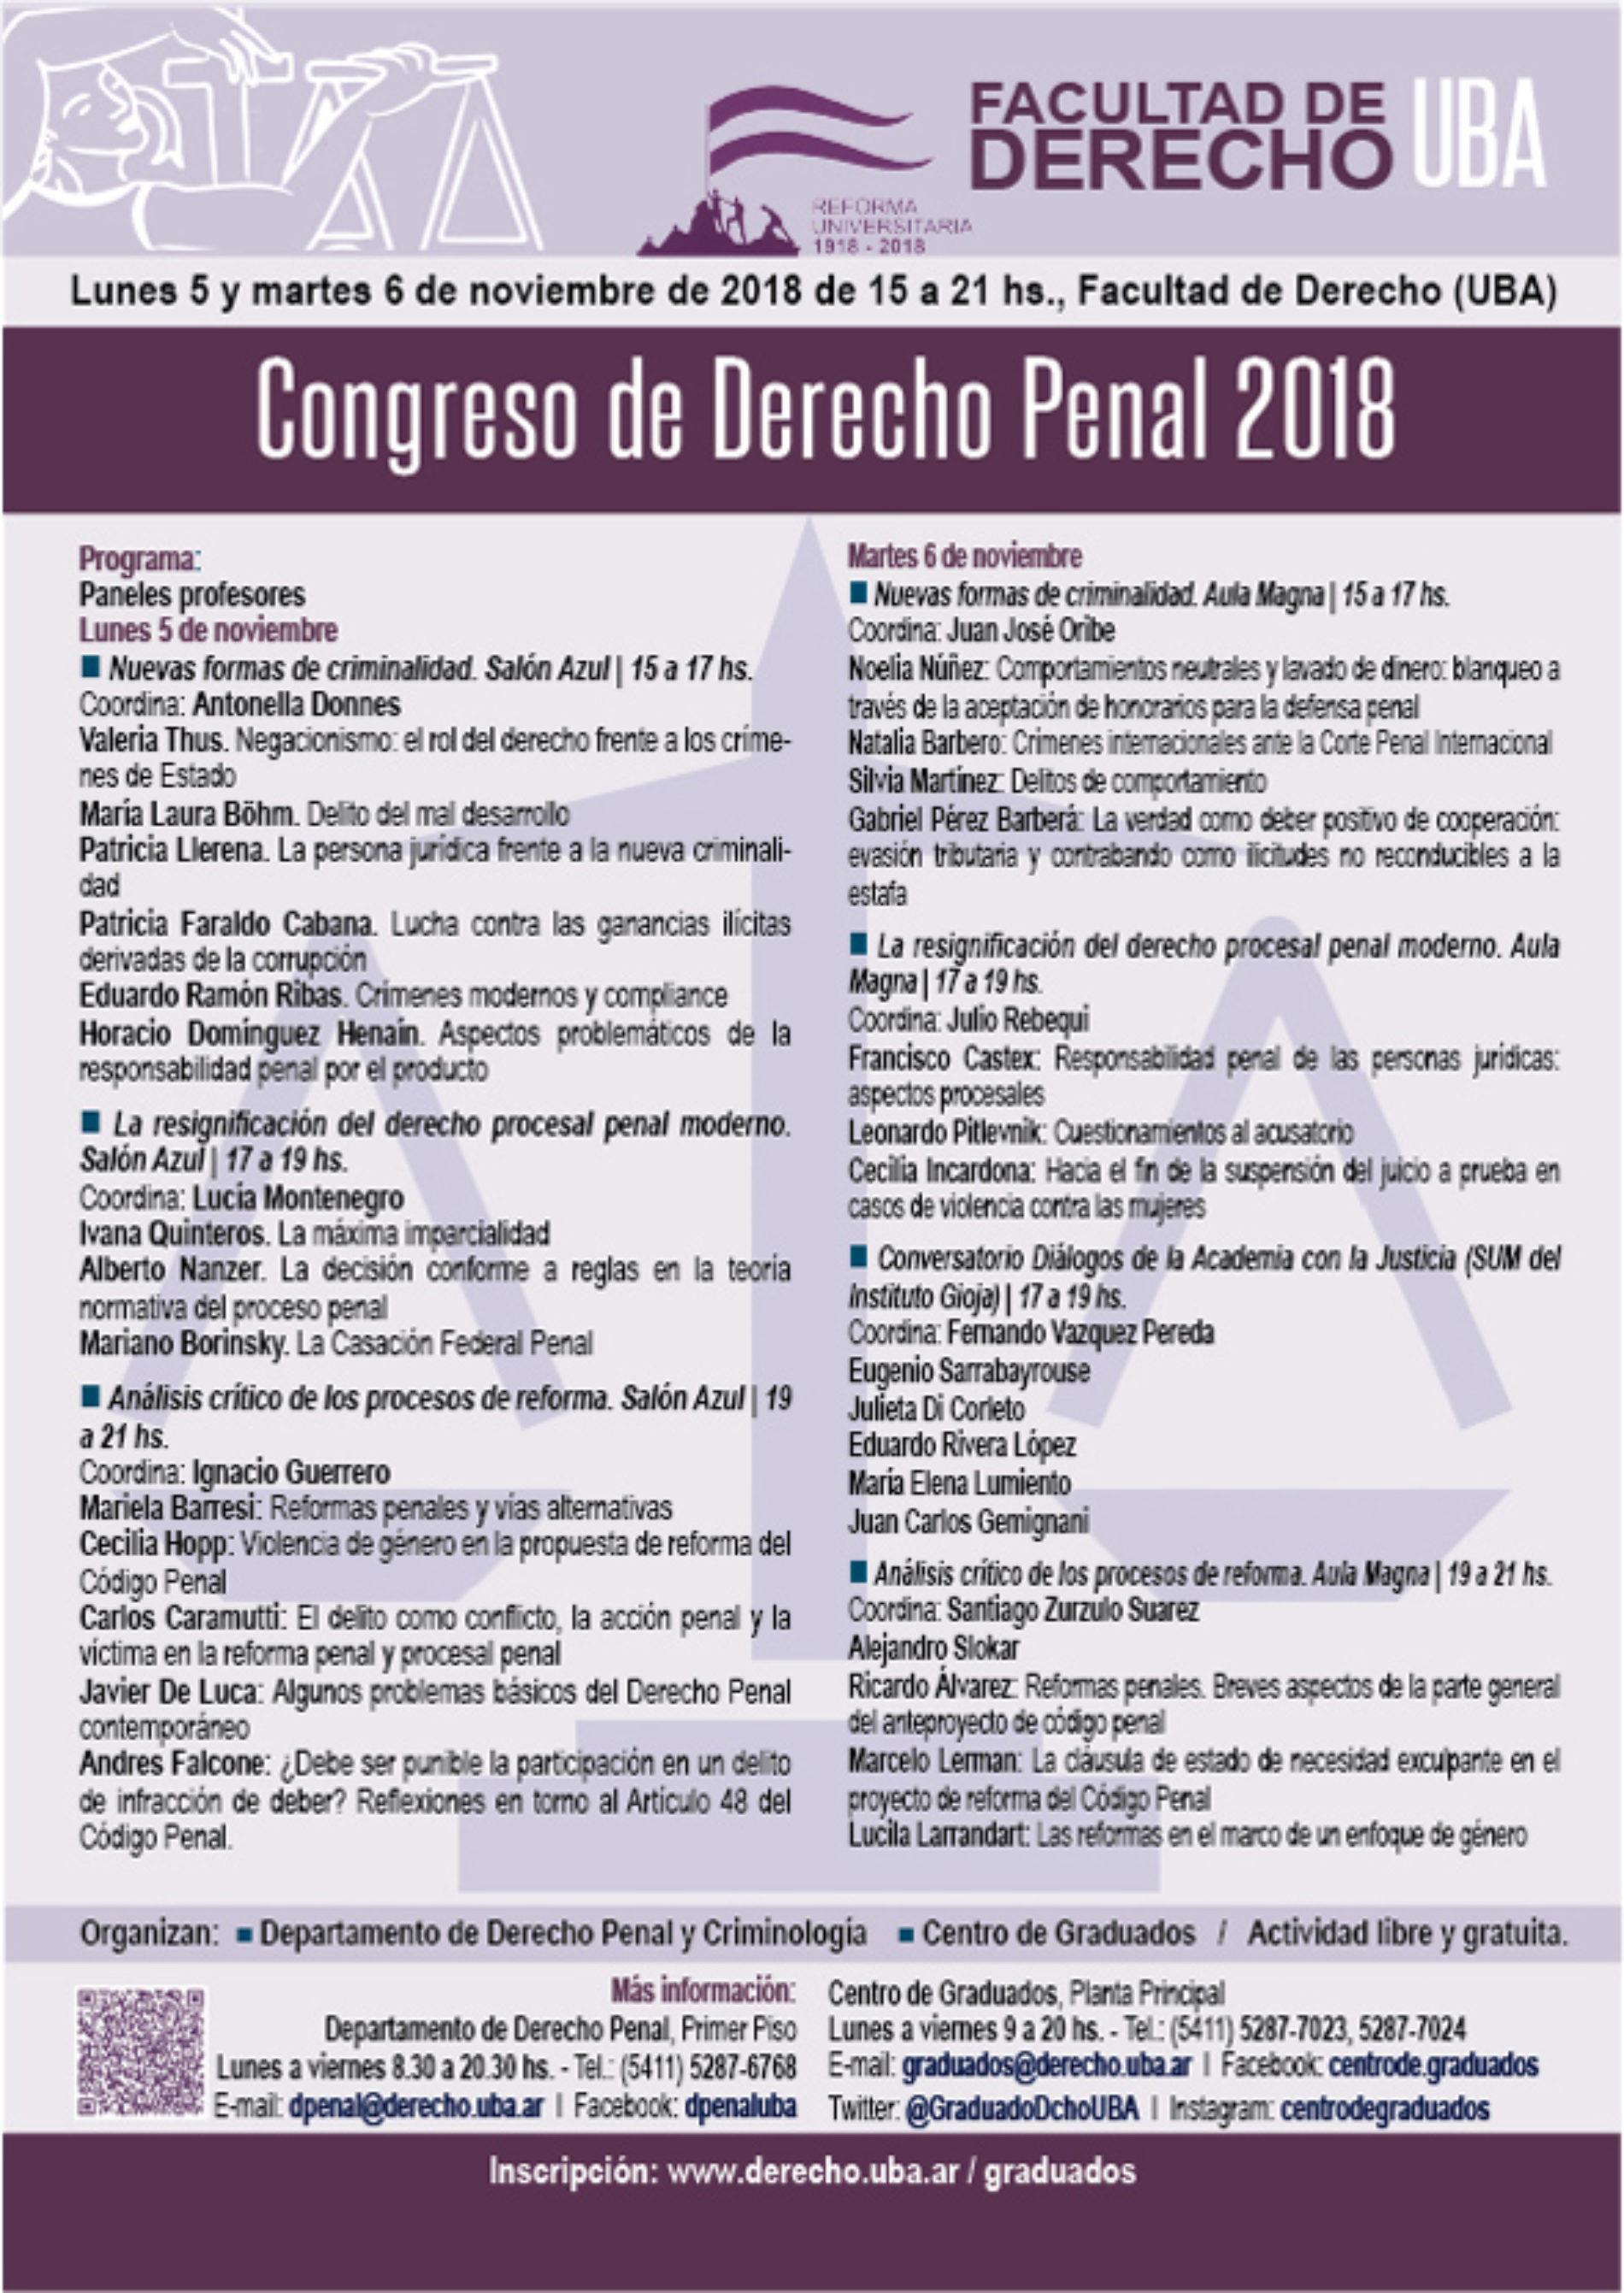 «CONGRESO DE DERECHO PENAL 2018»